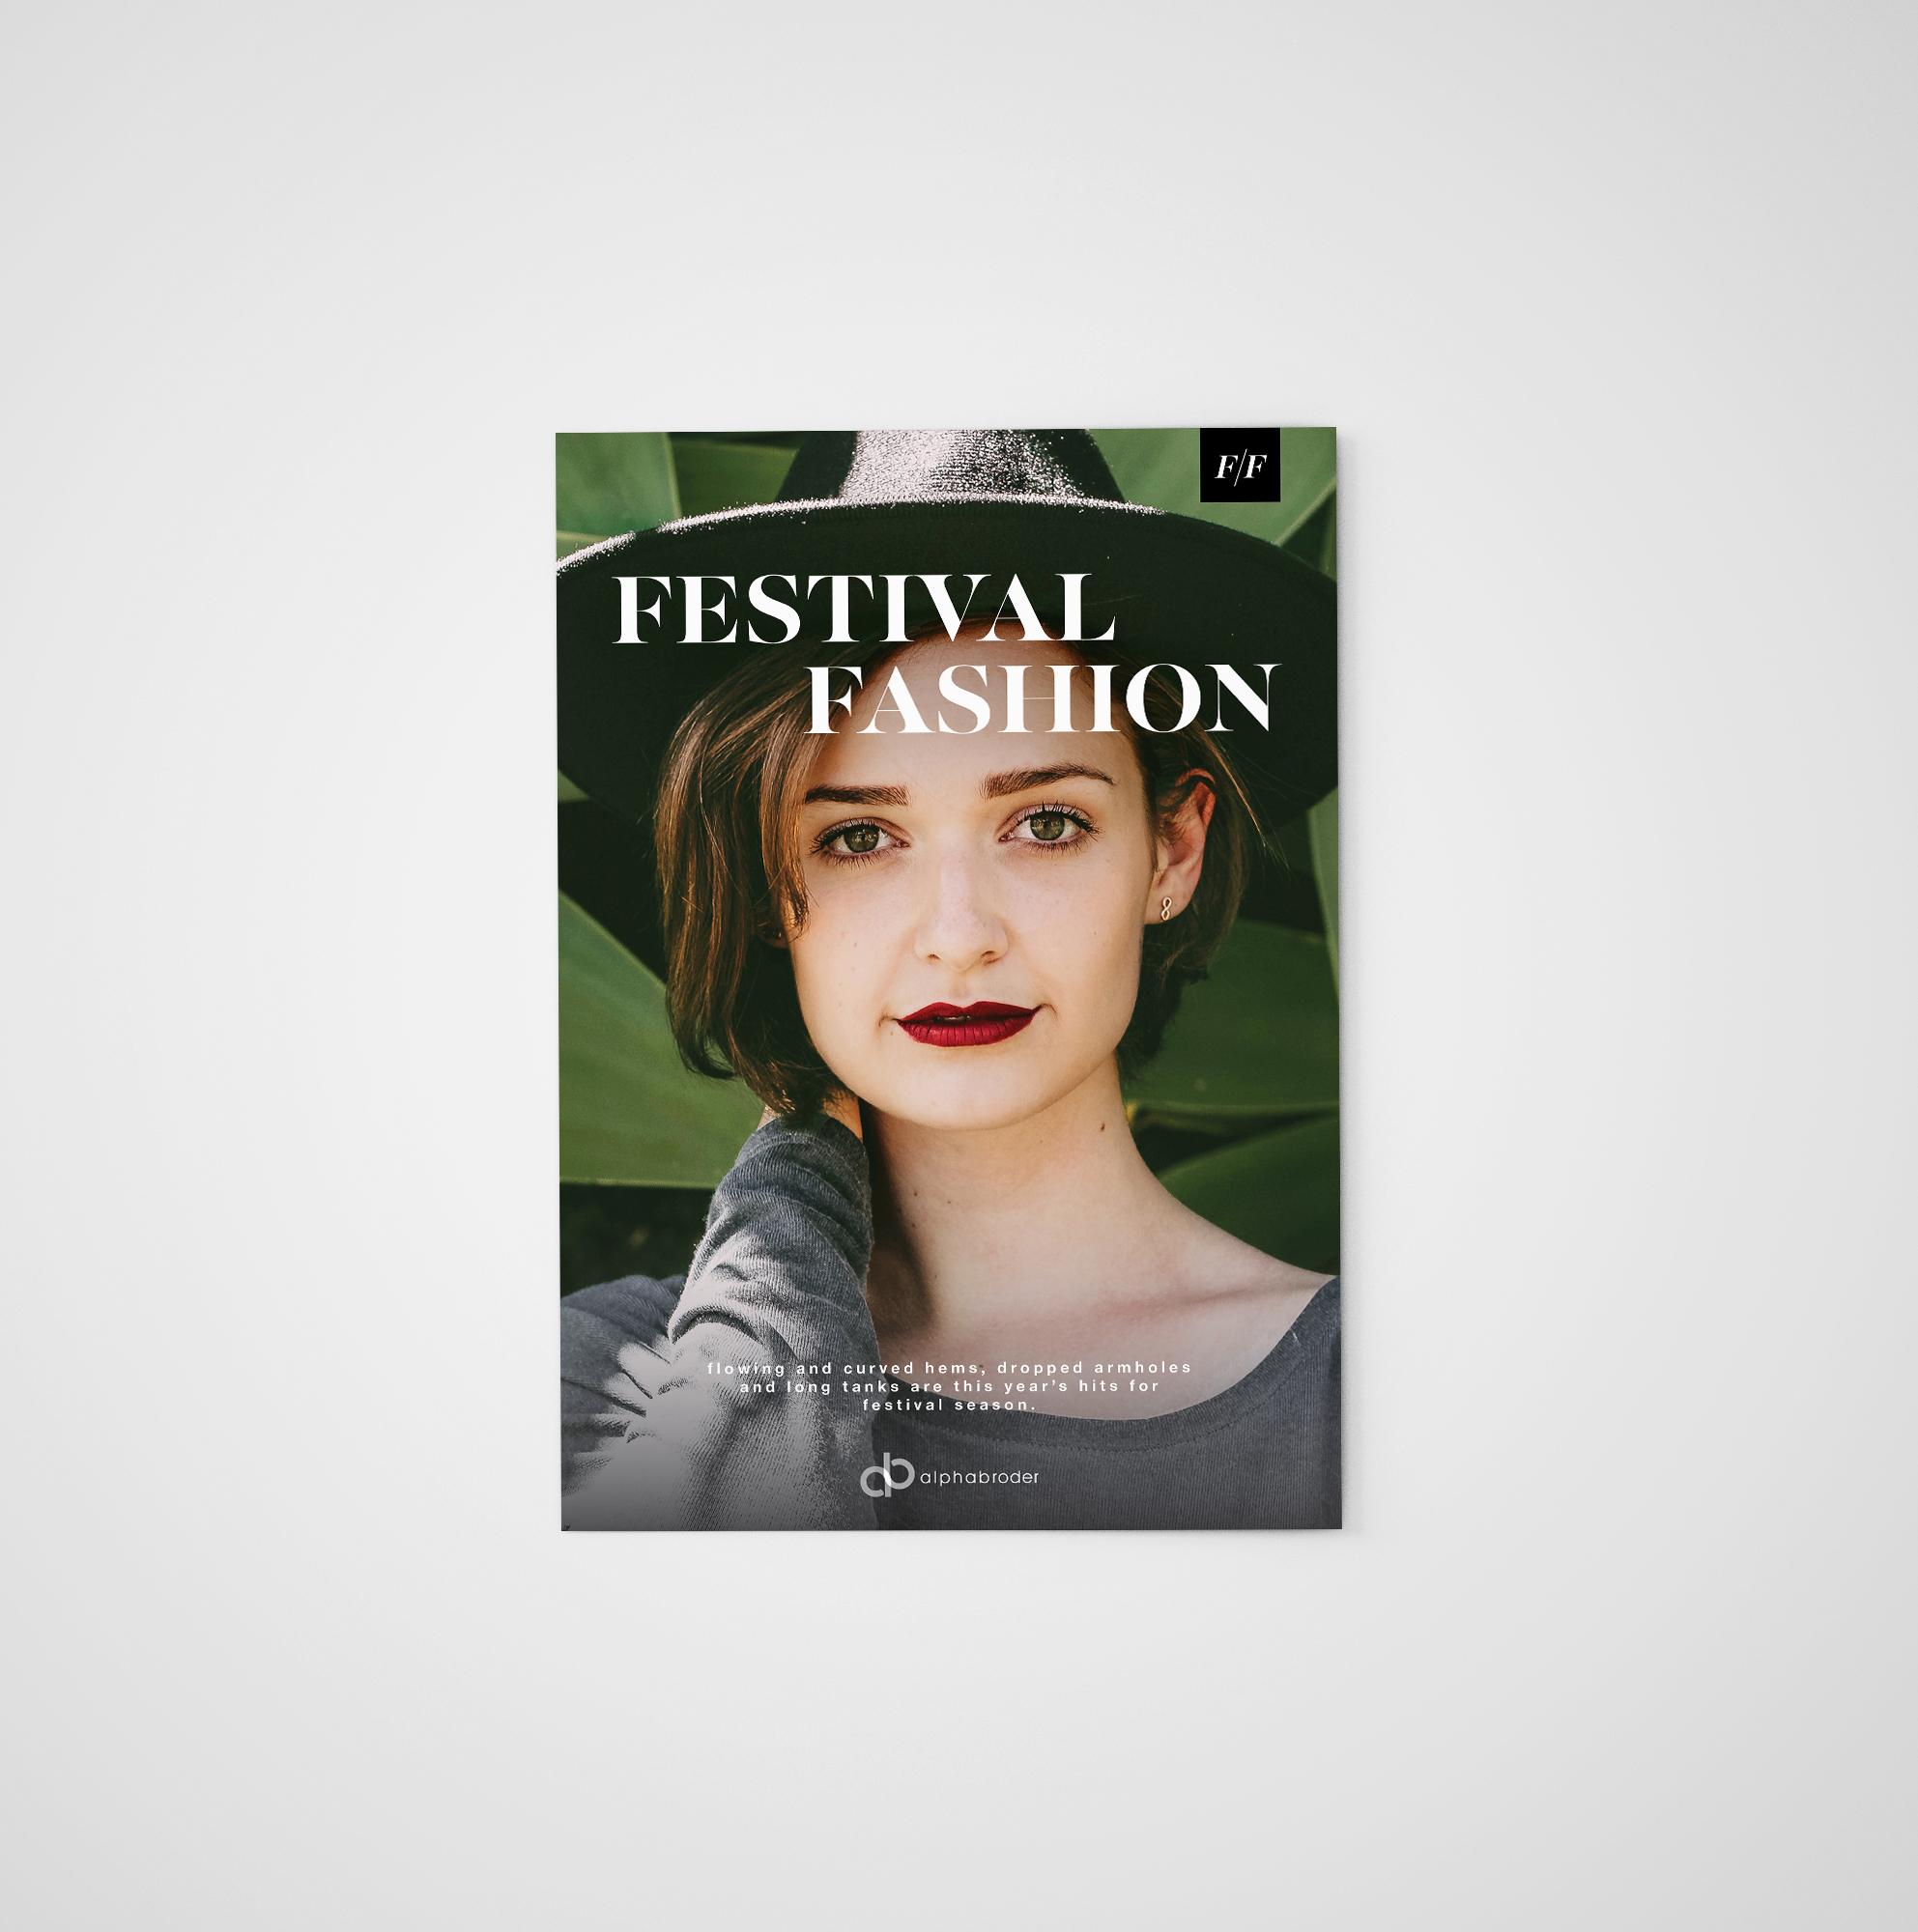 S/S '17 Festival Fashion Print Ad